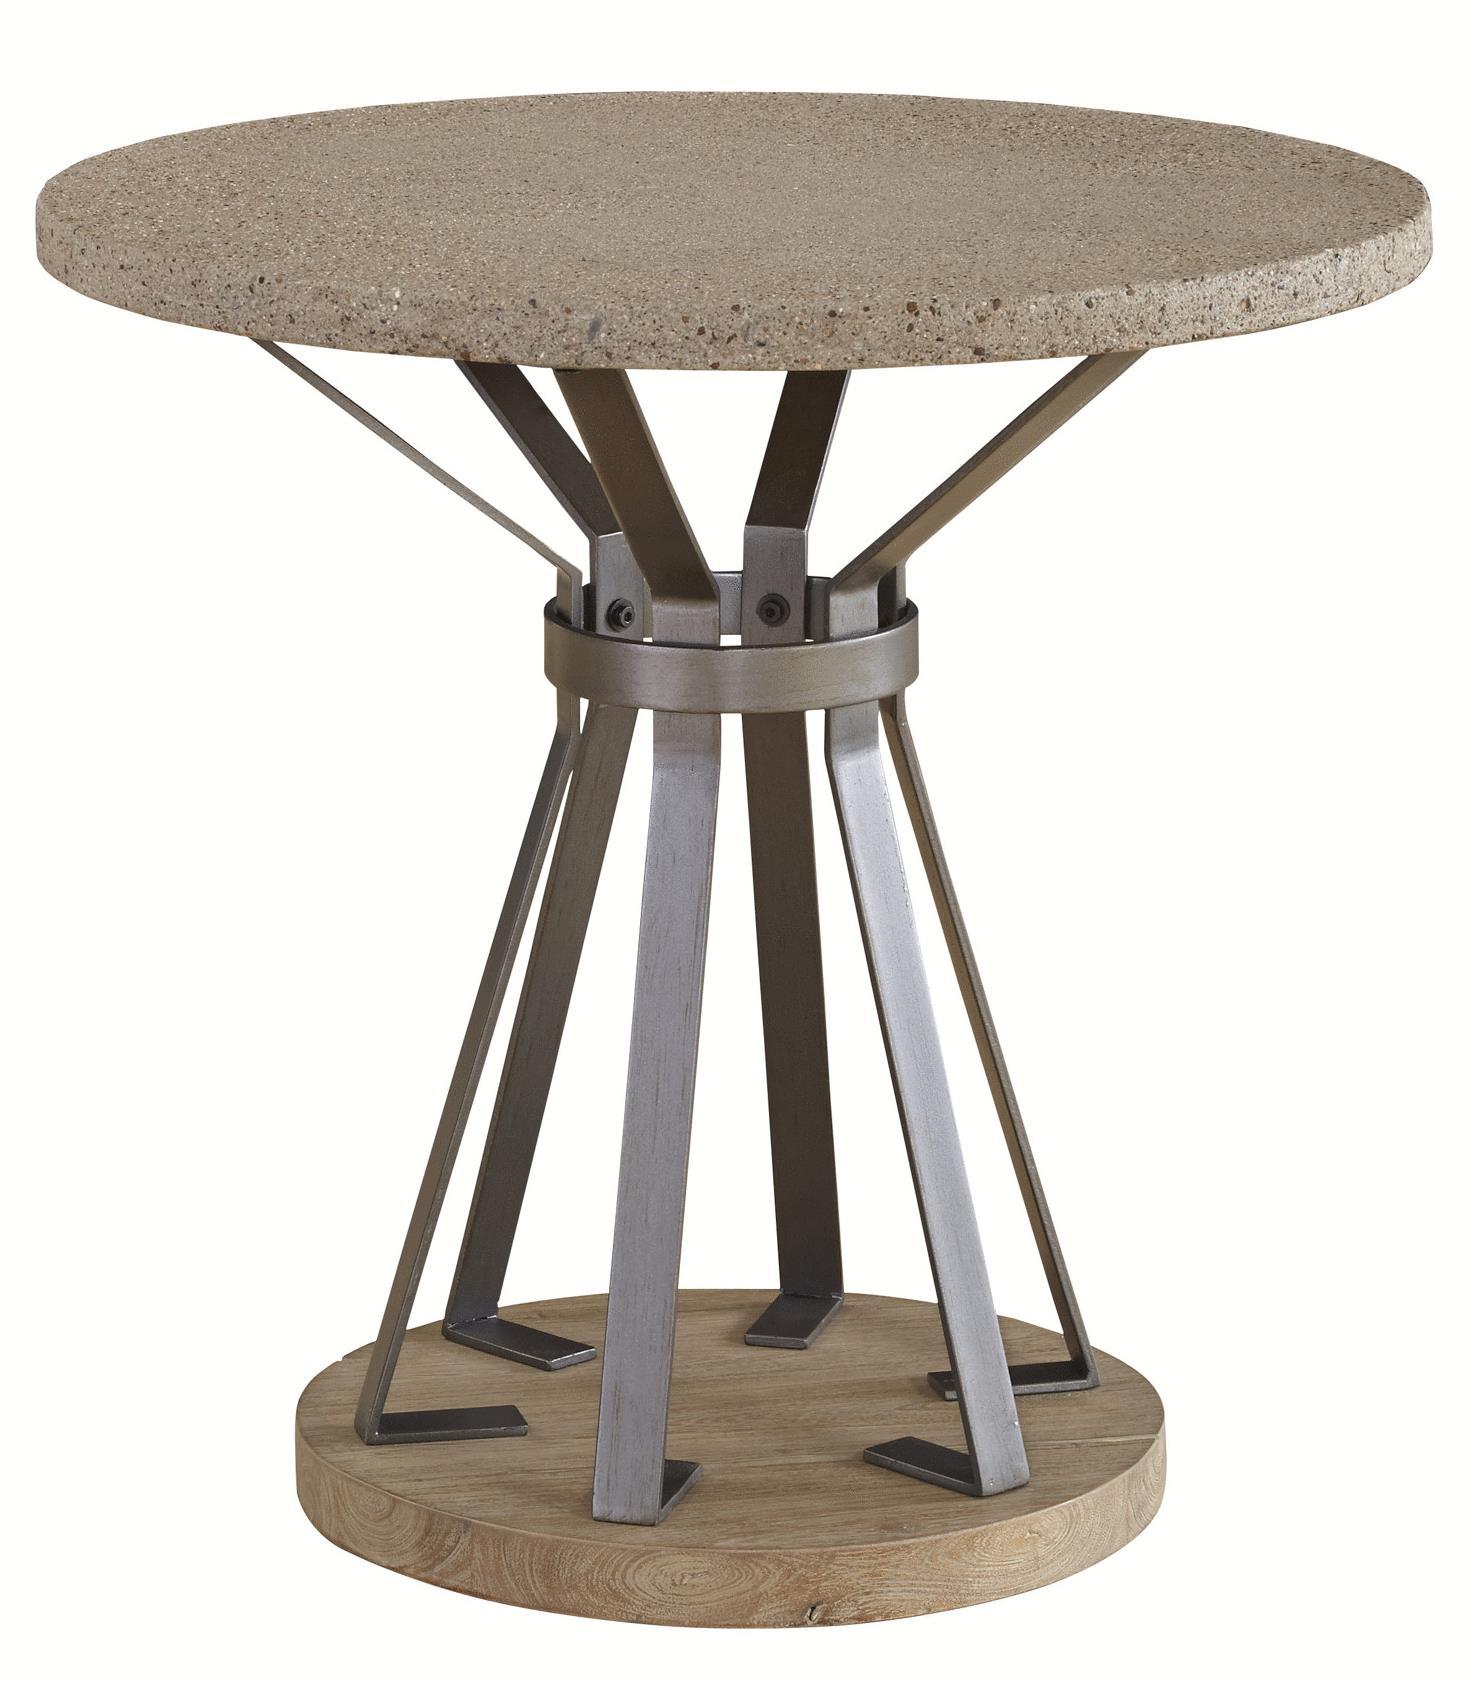 Phantasy Concrete By Casana Casana Hamlin Round End Table Hamlin Round End Table Concrete Dream Home Round End Table Wayfair Round End Table houzz-03 Round End Table